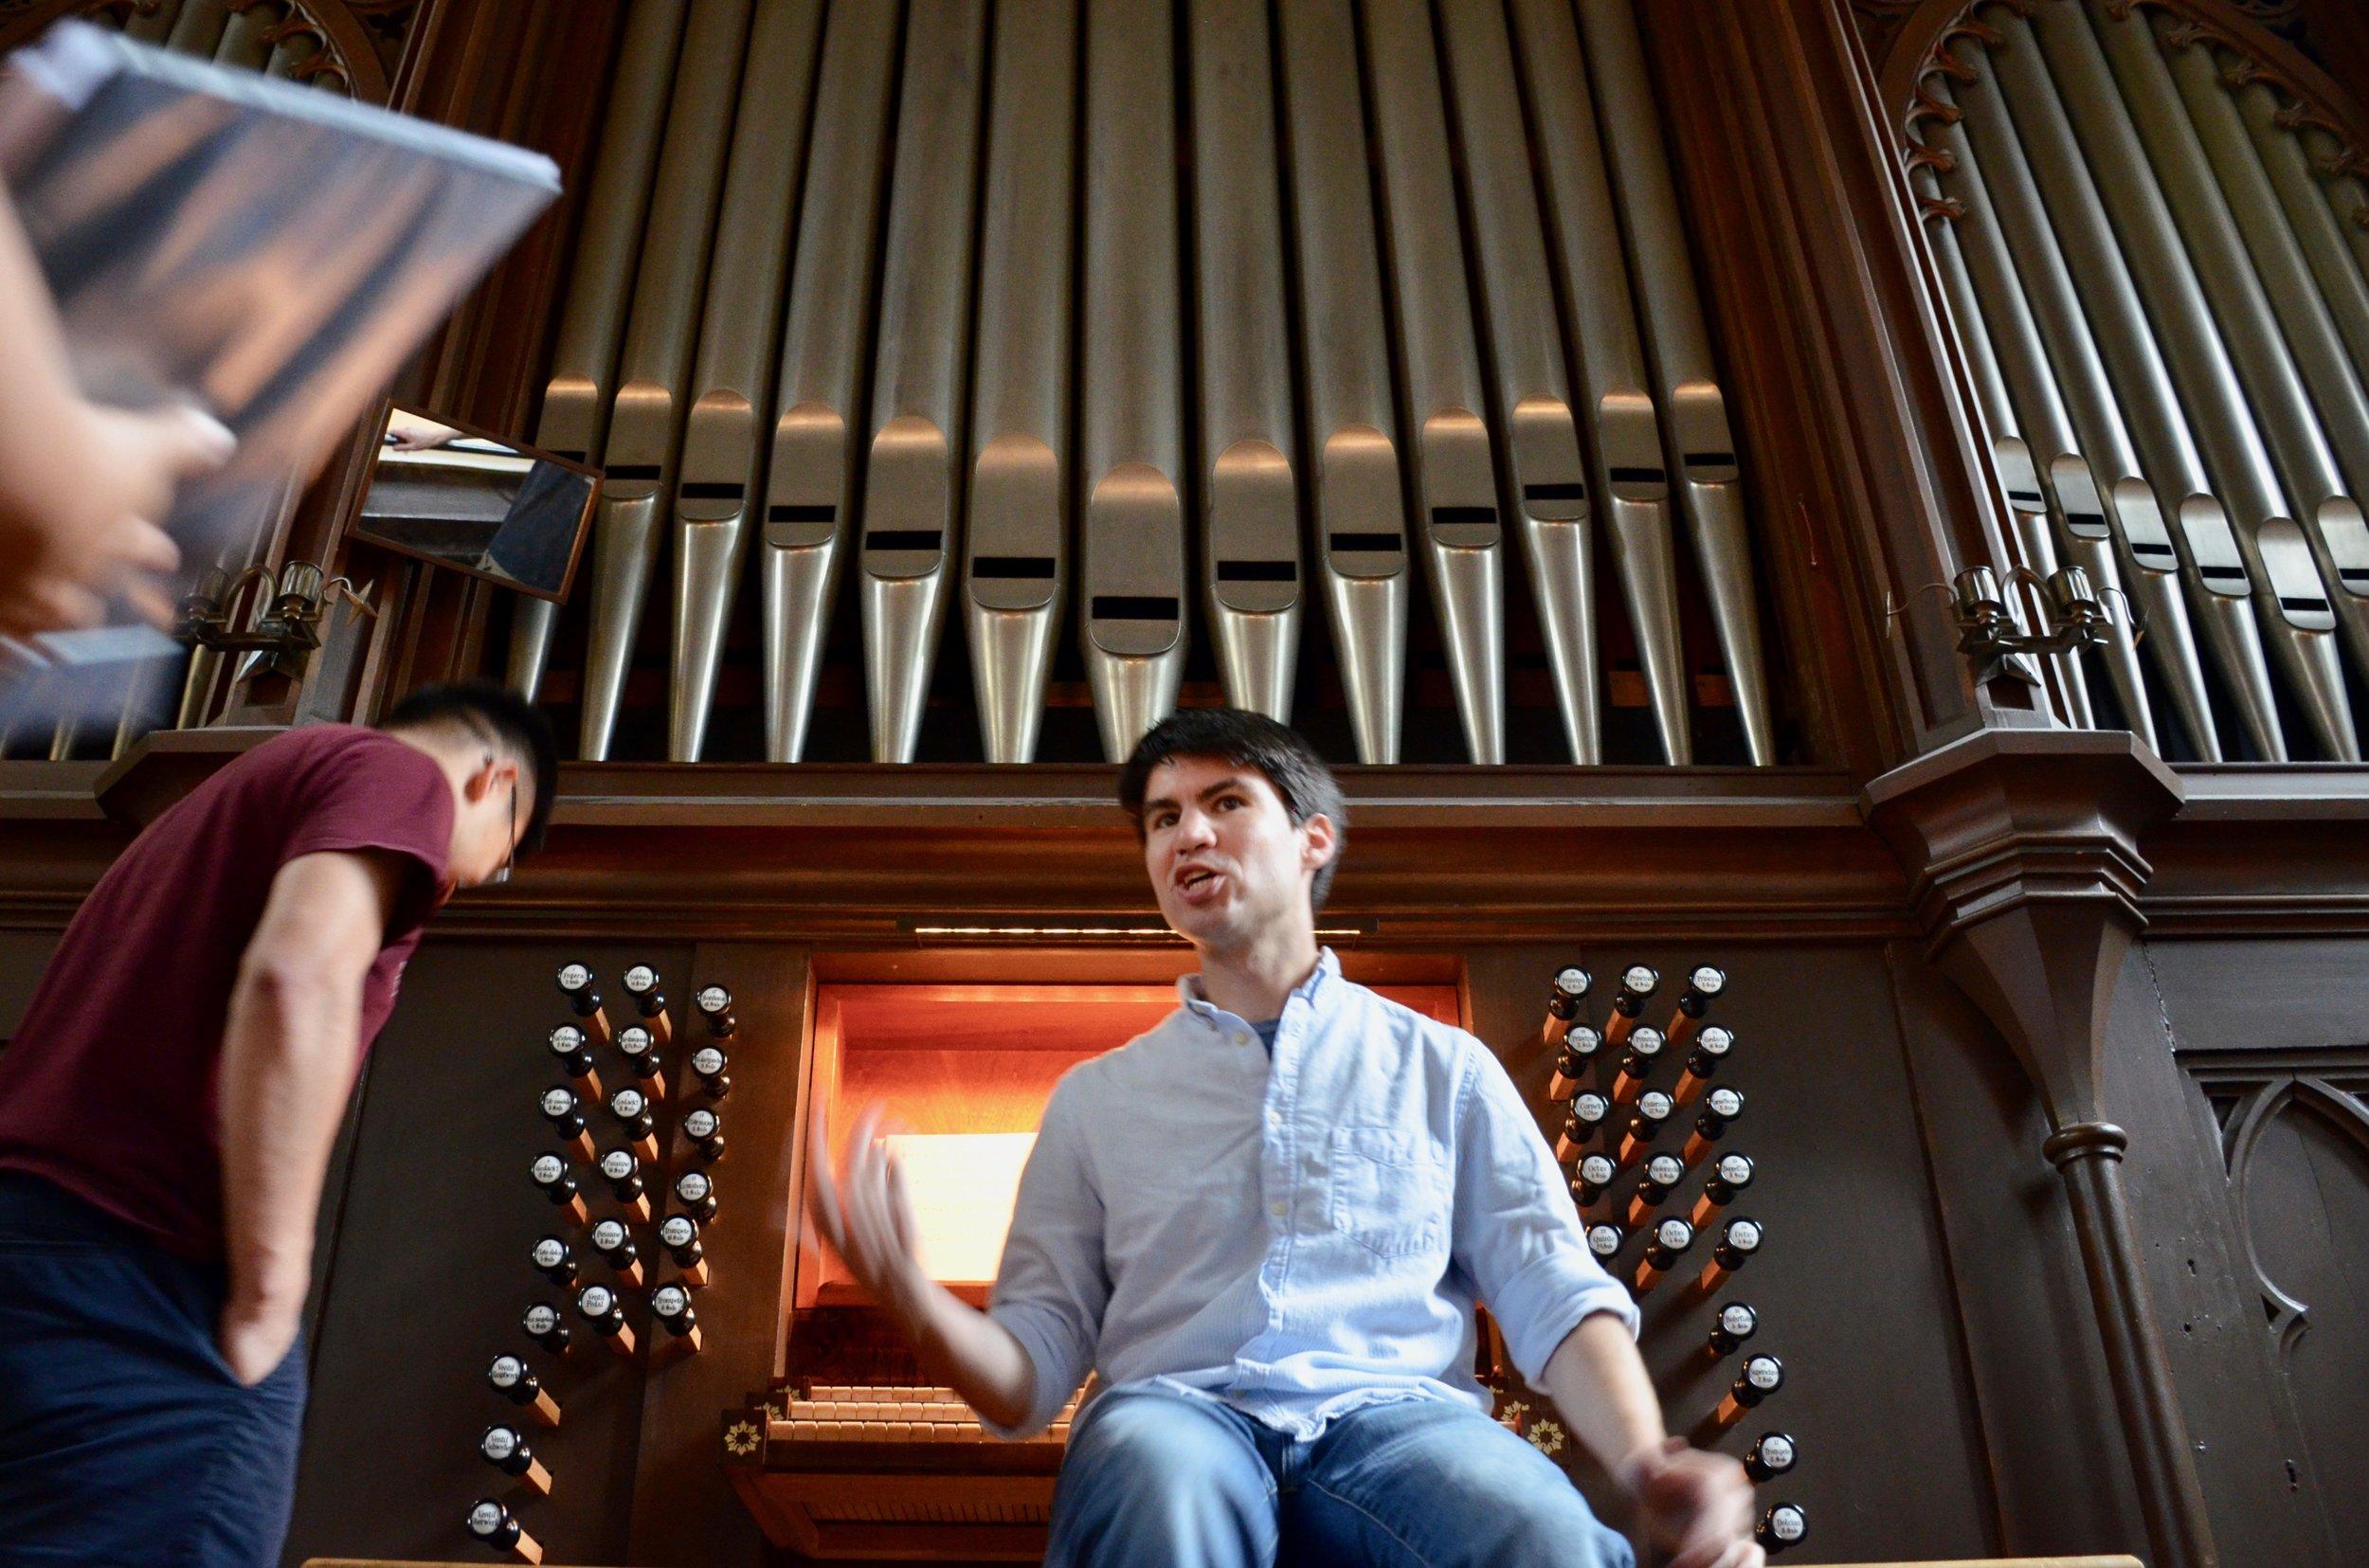 Brandon Santini at the 1861 Marcussen & Søn organ in Haga Church, Göteborg, Sweden.